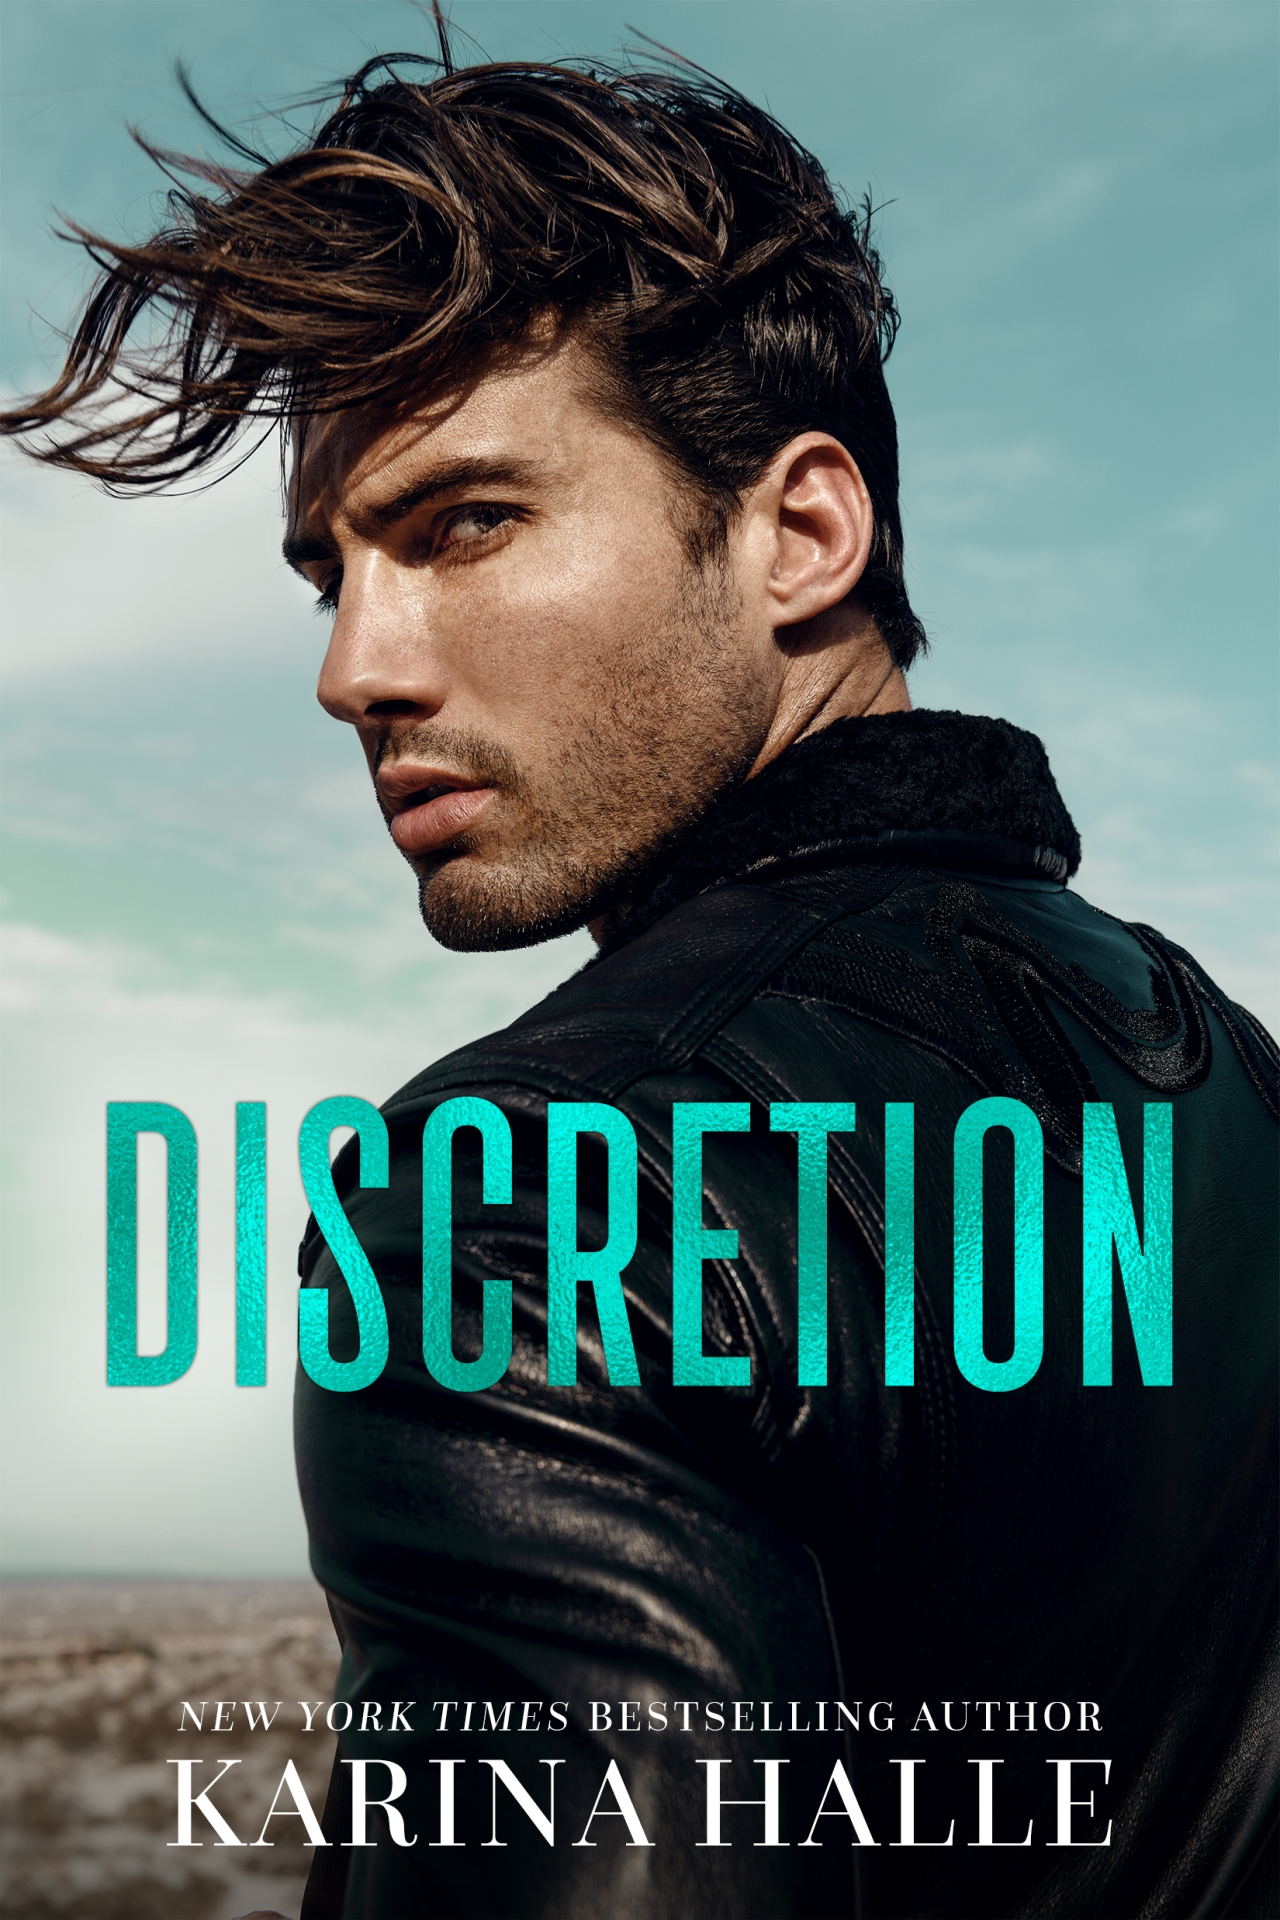 Discretion high res cover.jpg